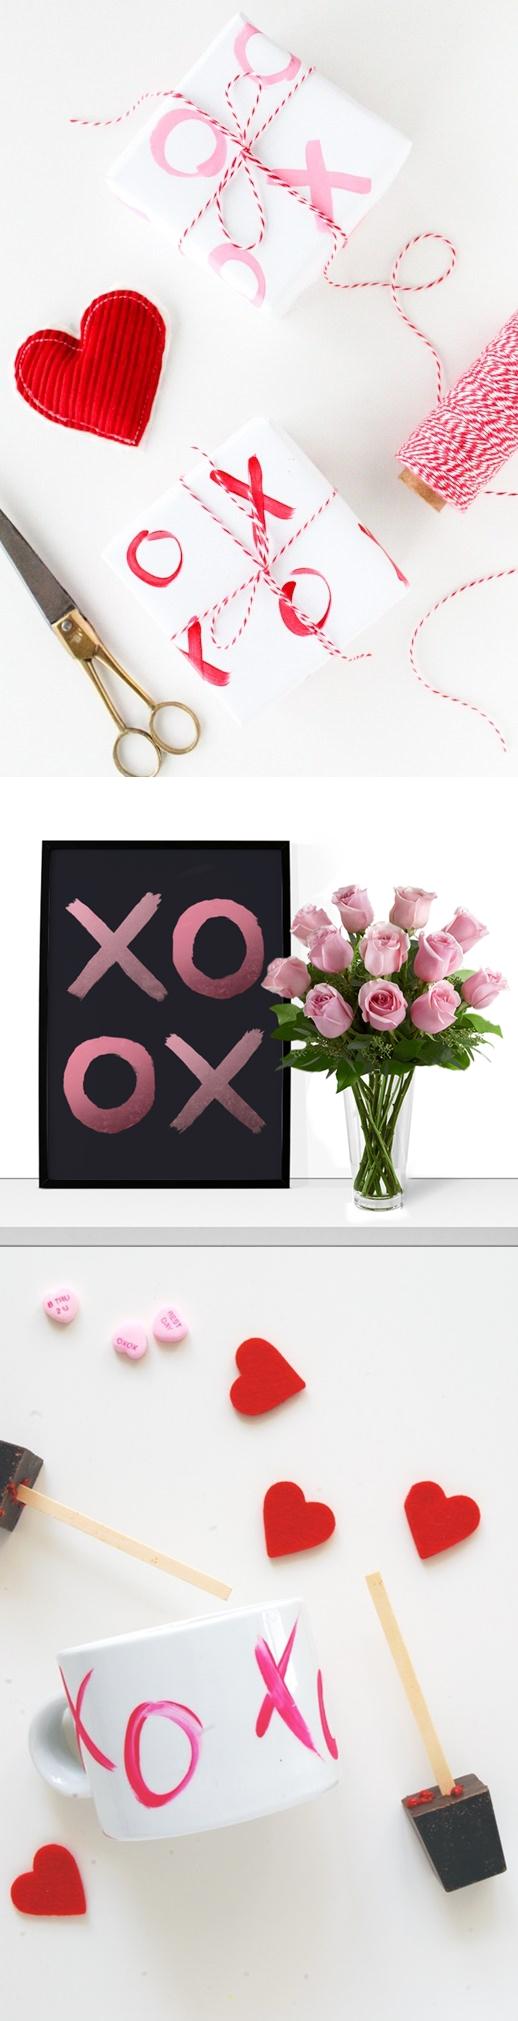 Valentine's Day XOXO Ideas